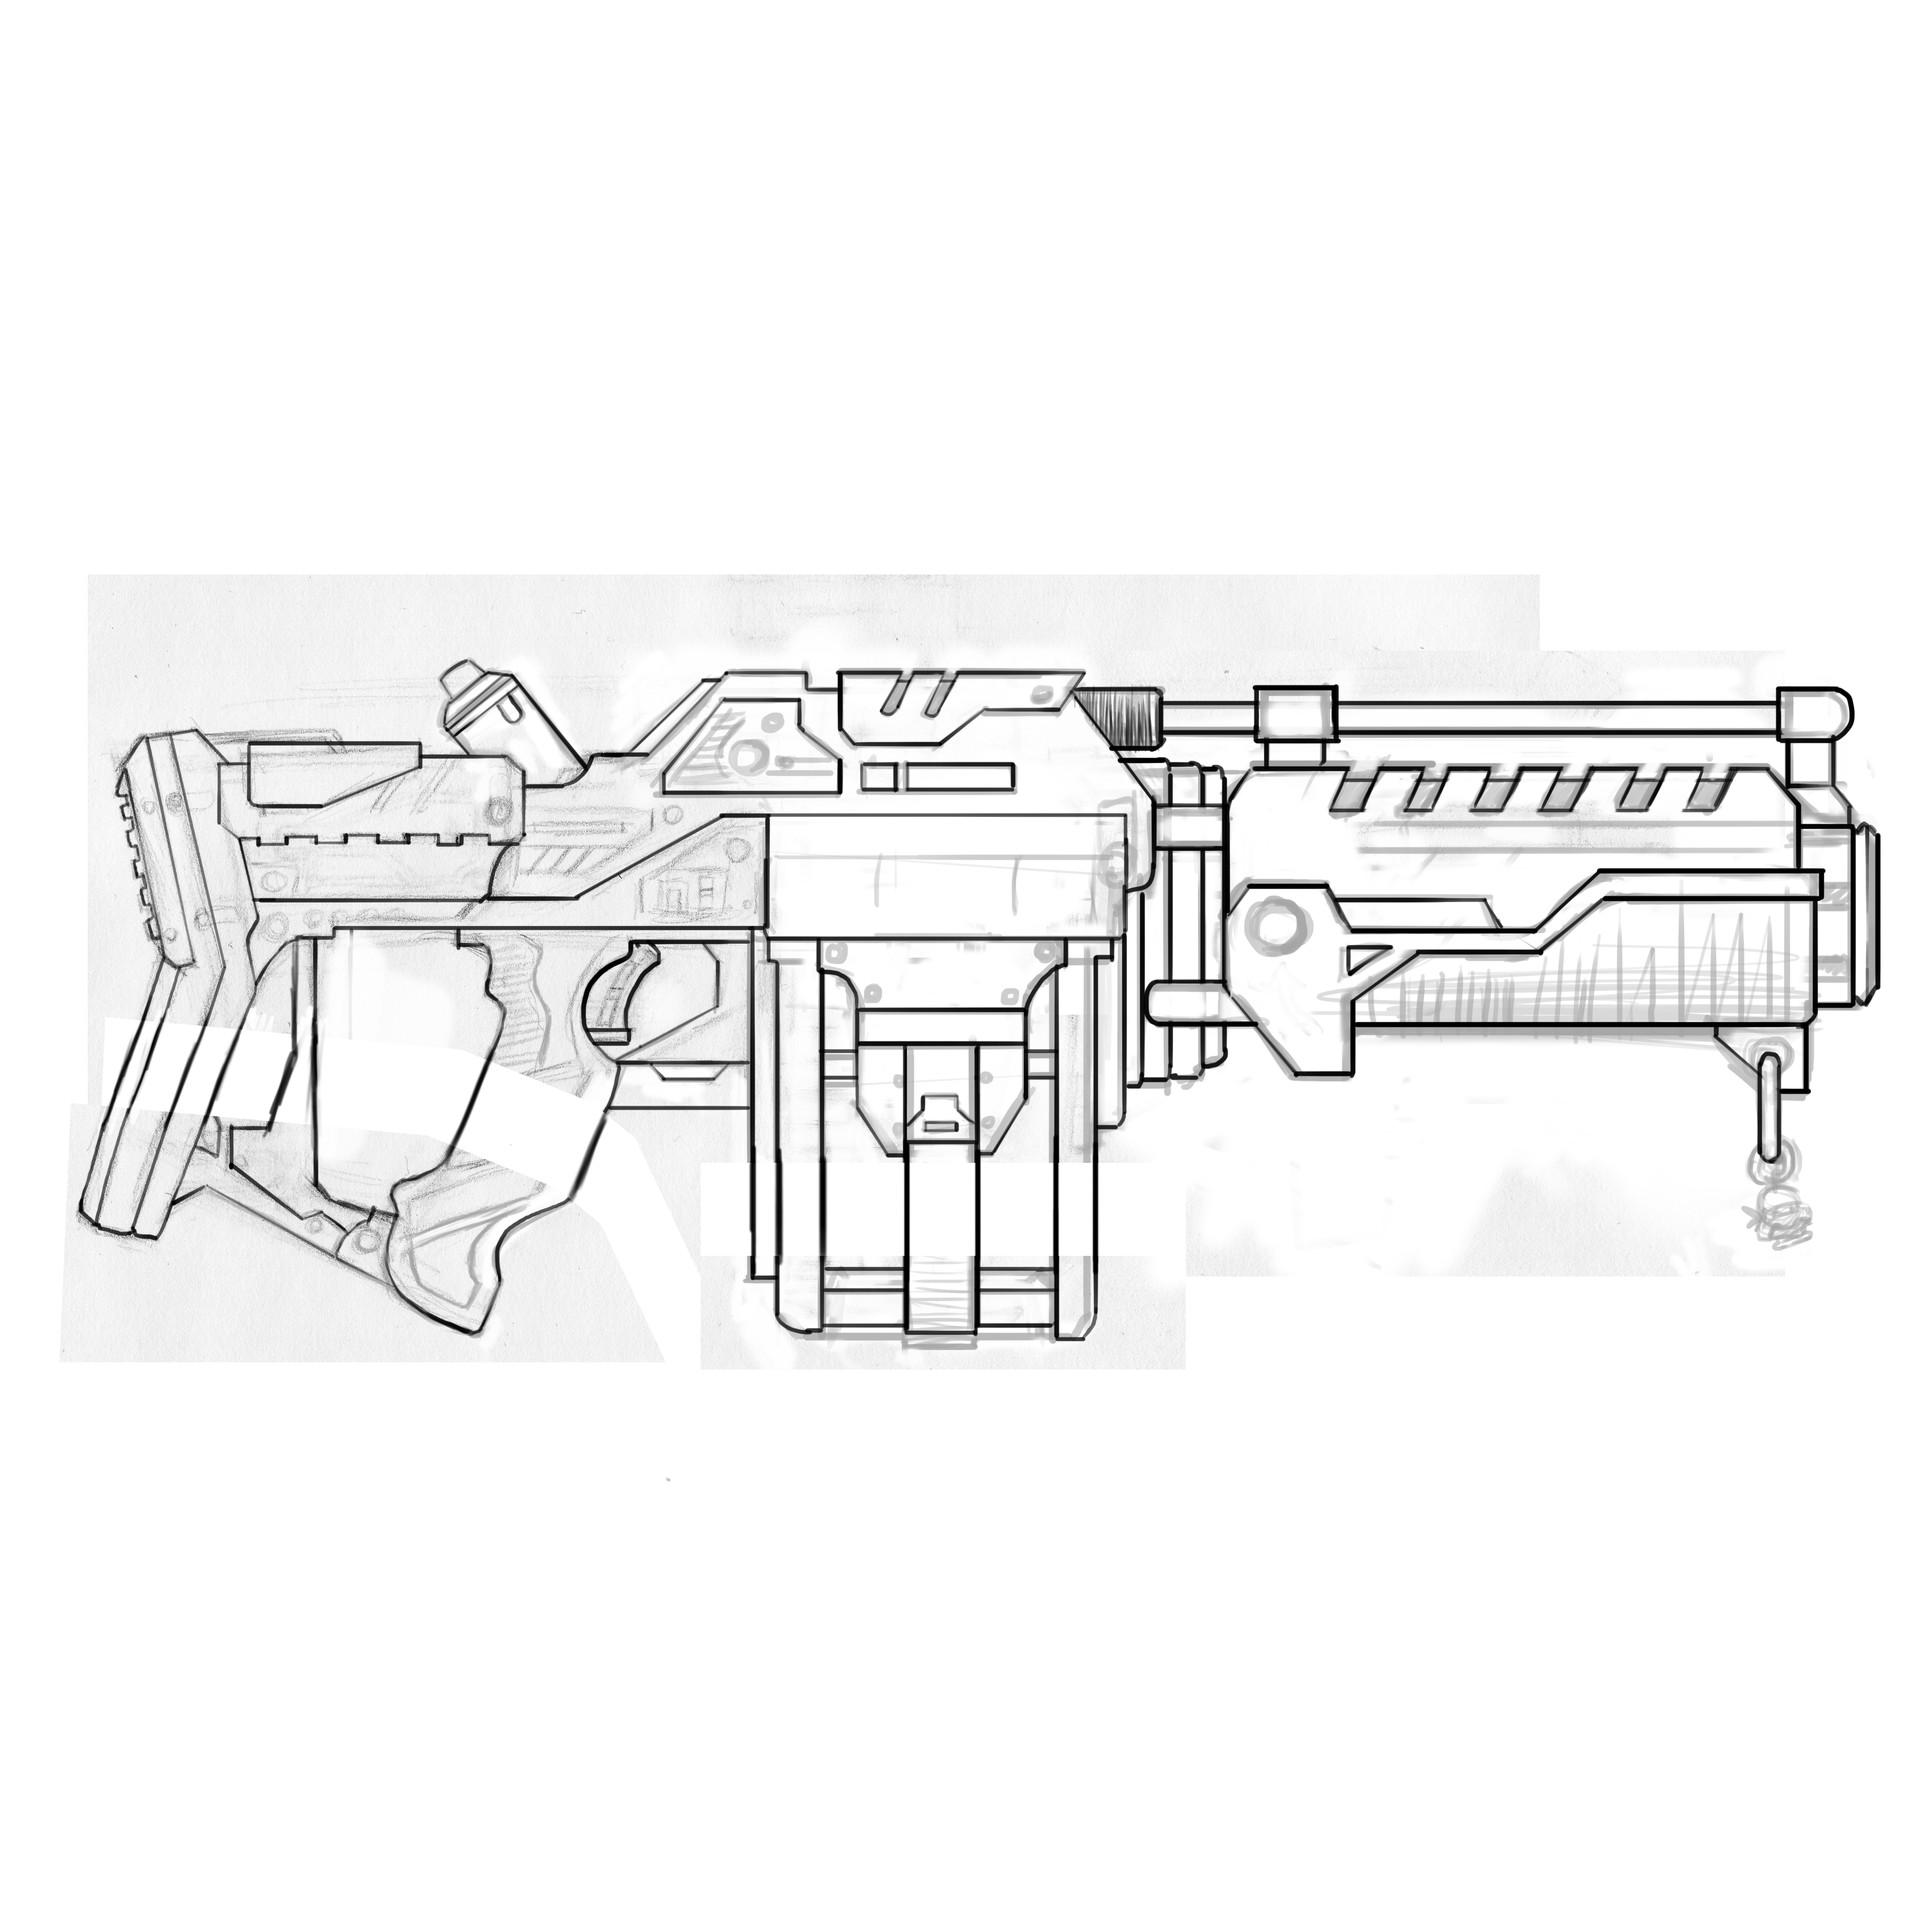 Damon woods beebop gun